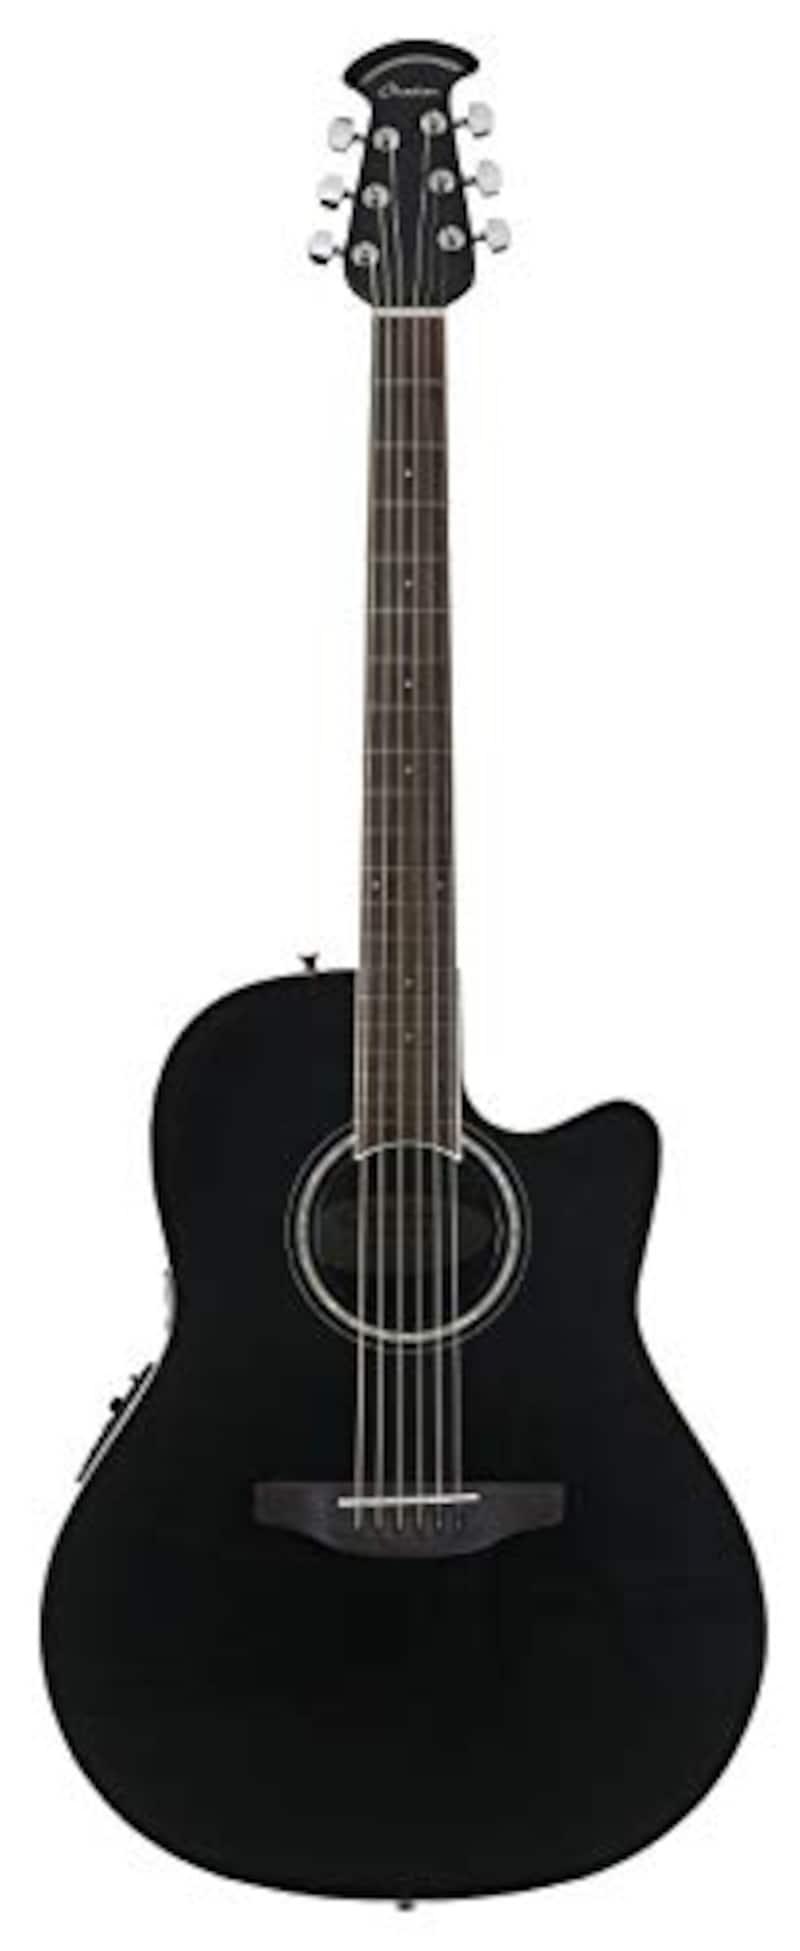 Ovation Celebrity,エレクトリック・アコースティックギター,CS24